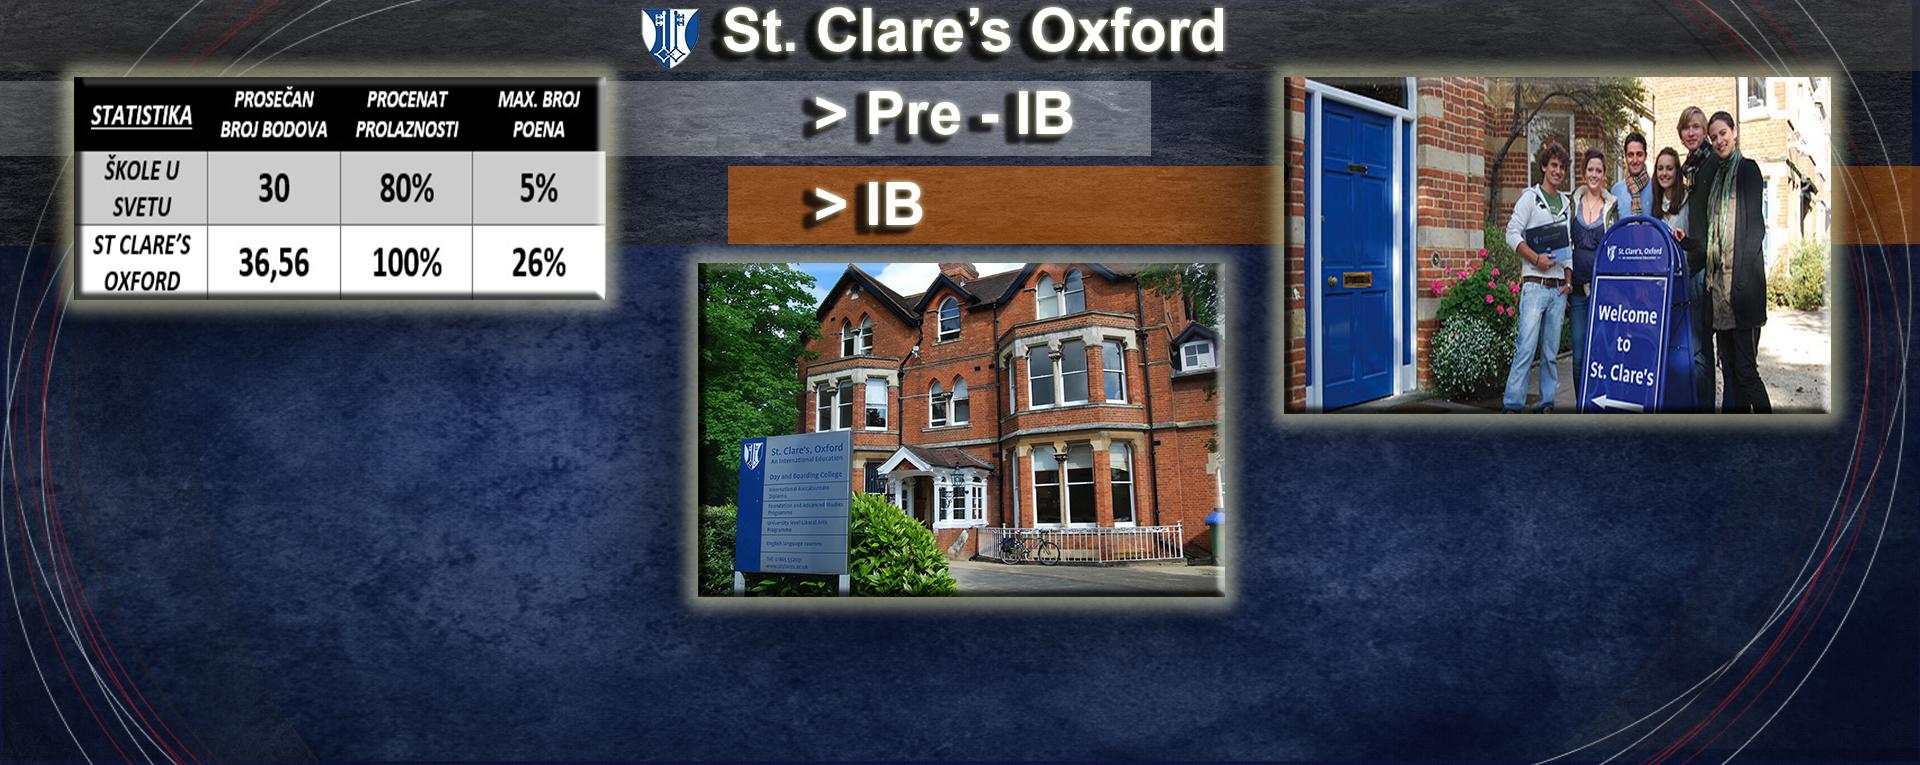 St-Clares-1